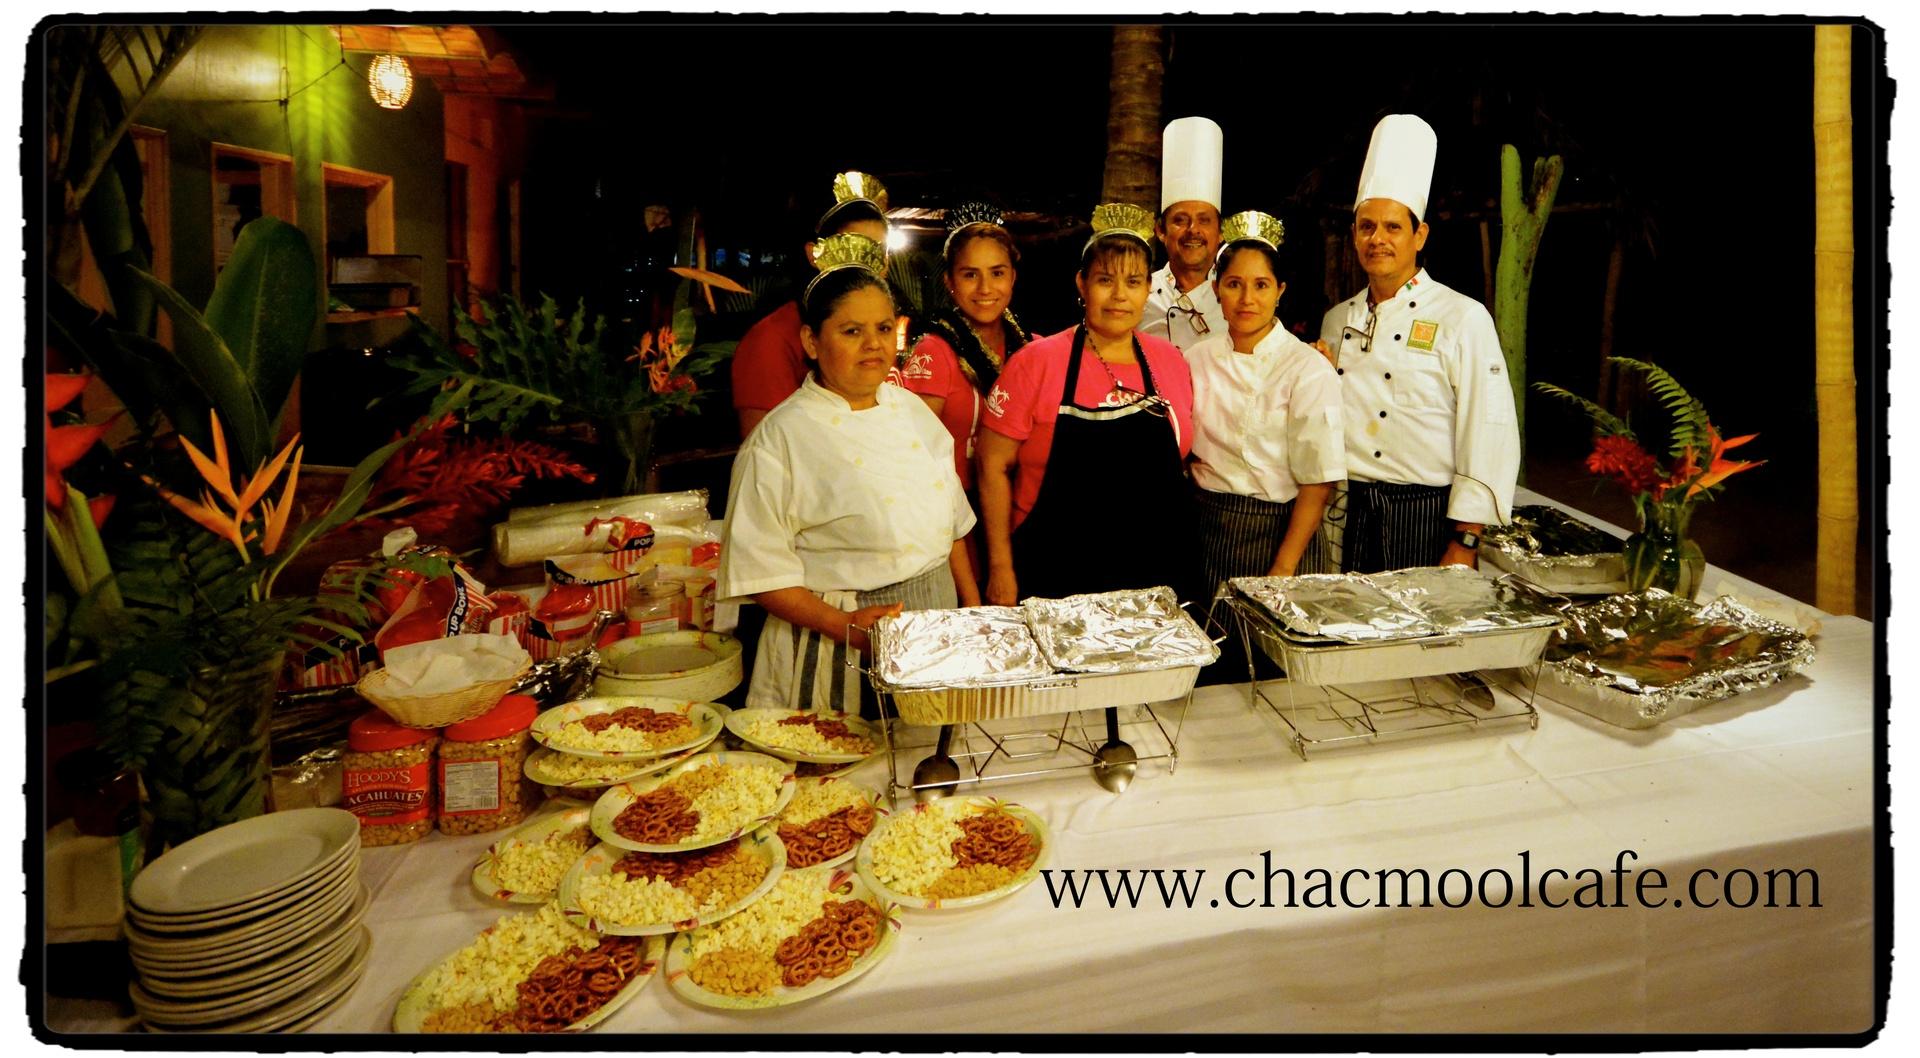 Chacmool staff chacala riviera nayarit